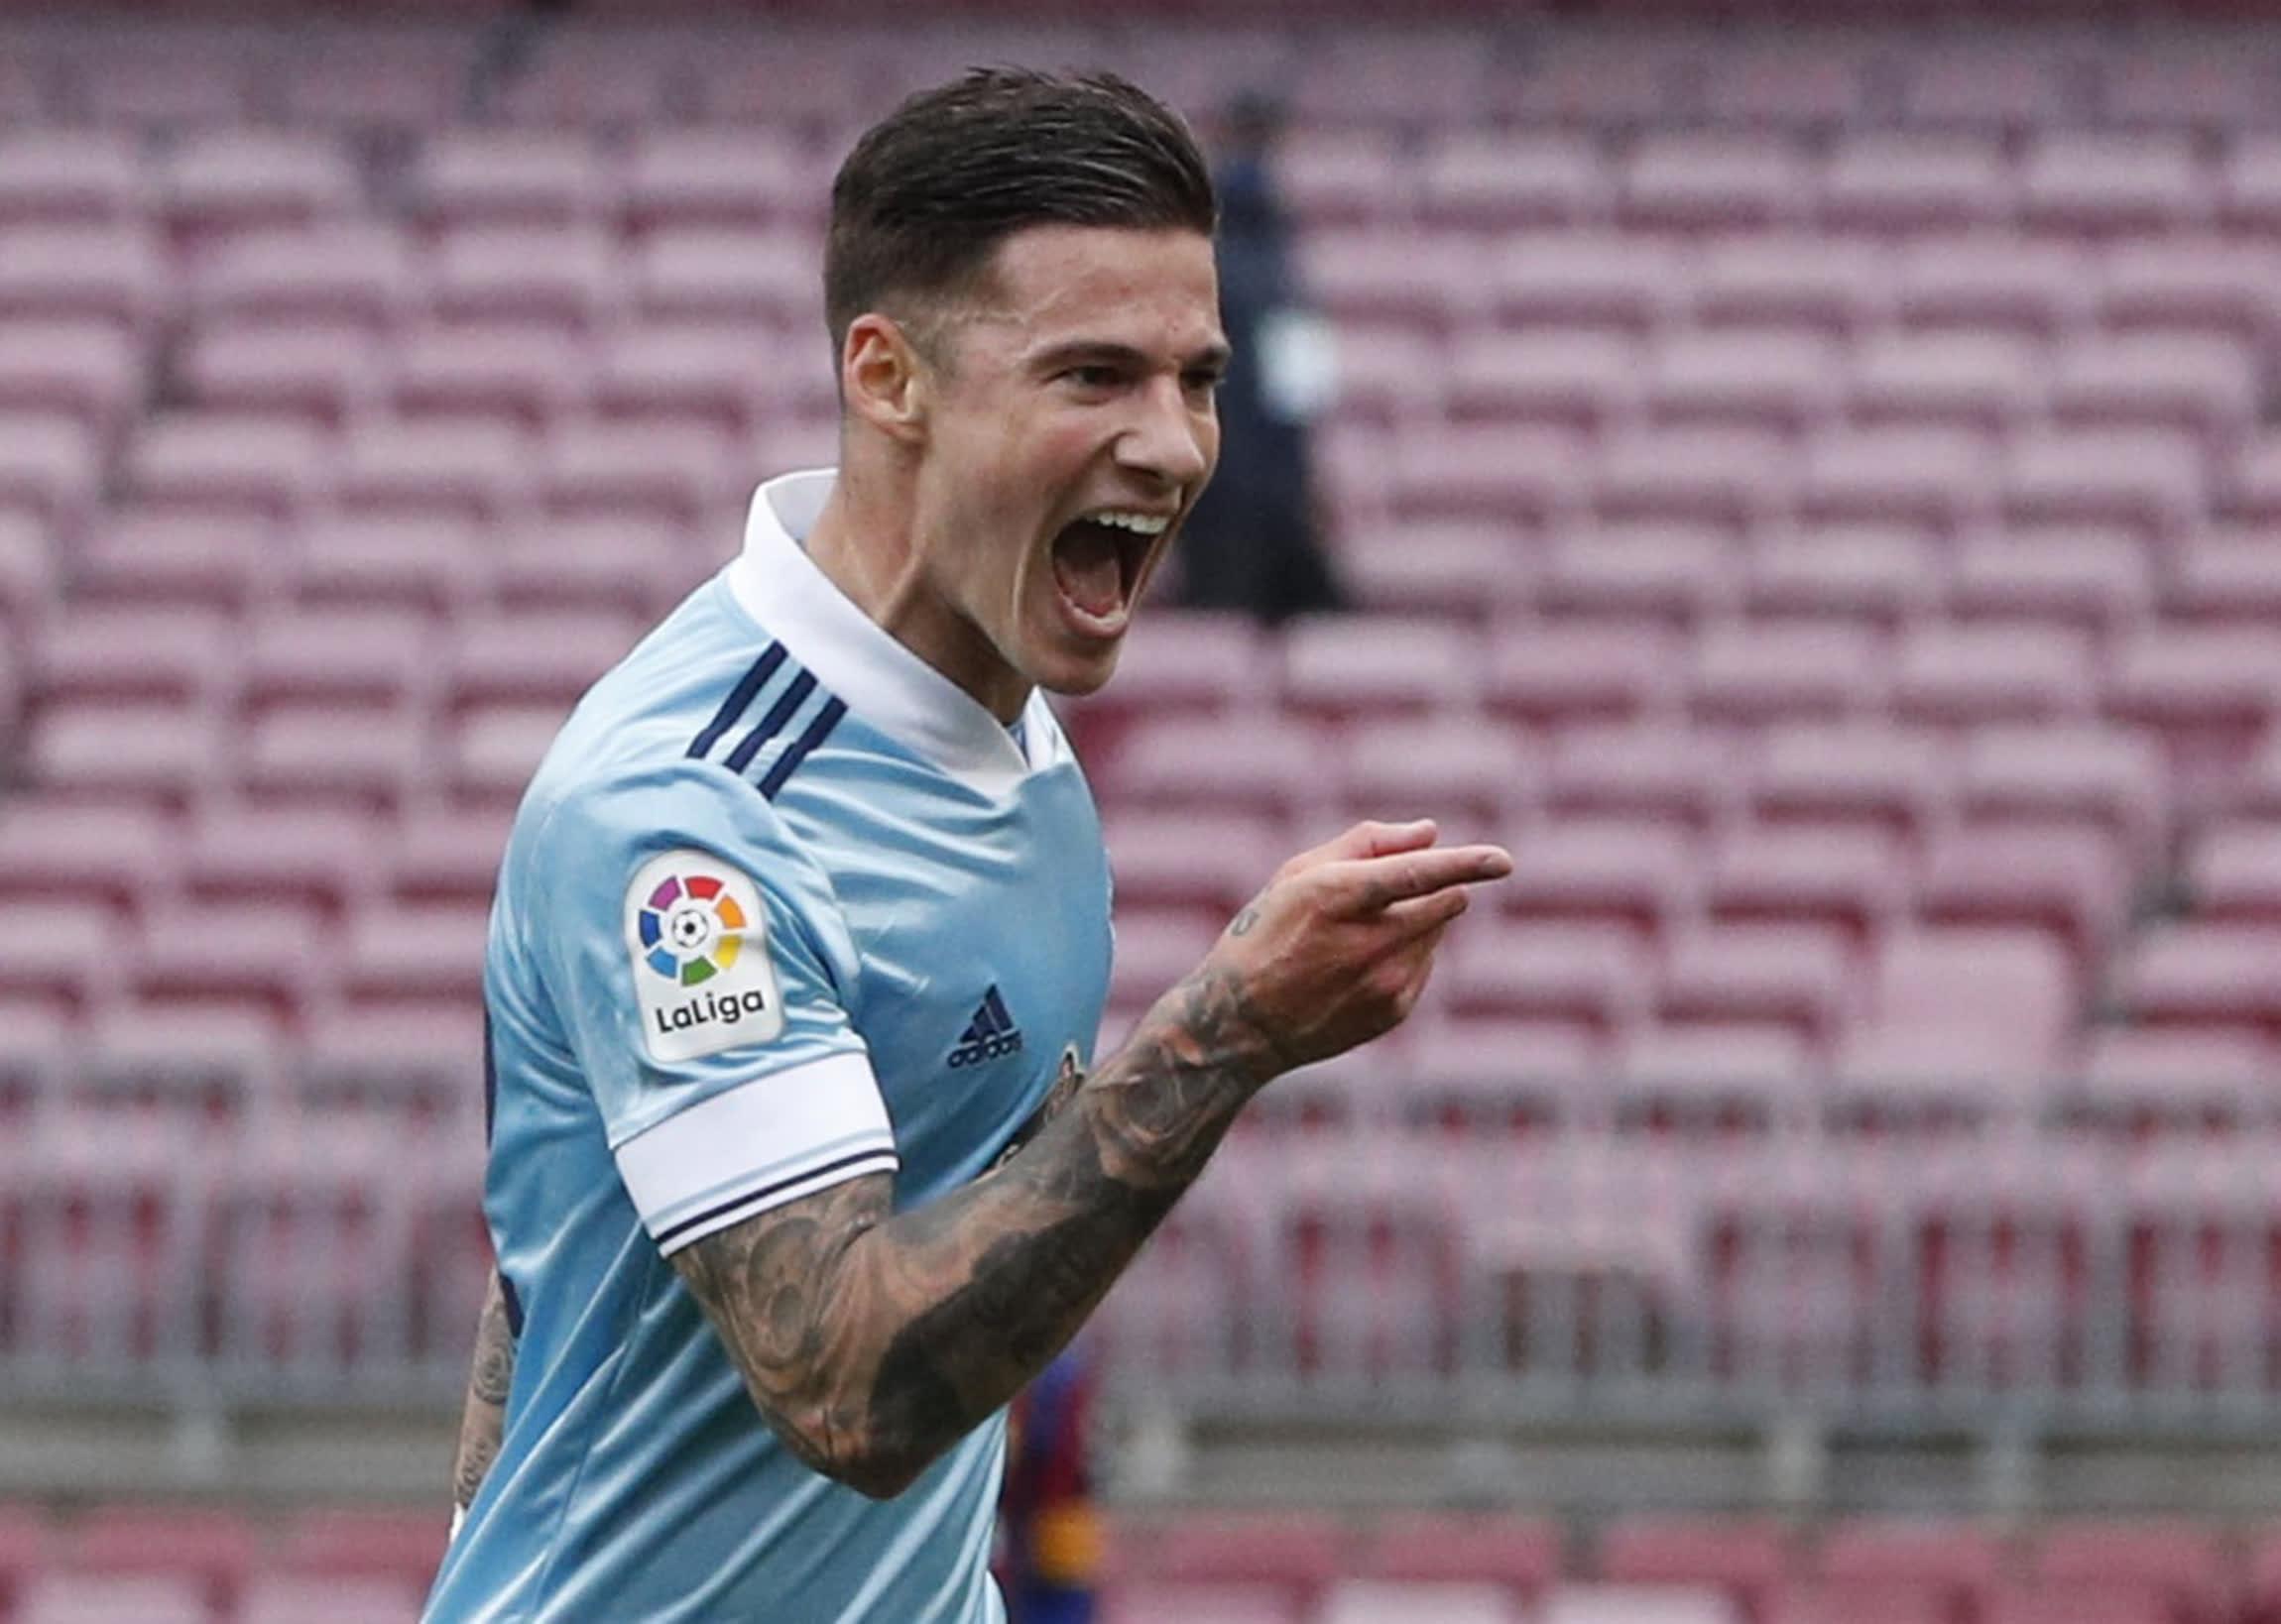 Santi appointed Salta Vigo player